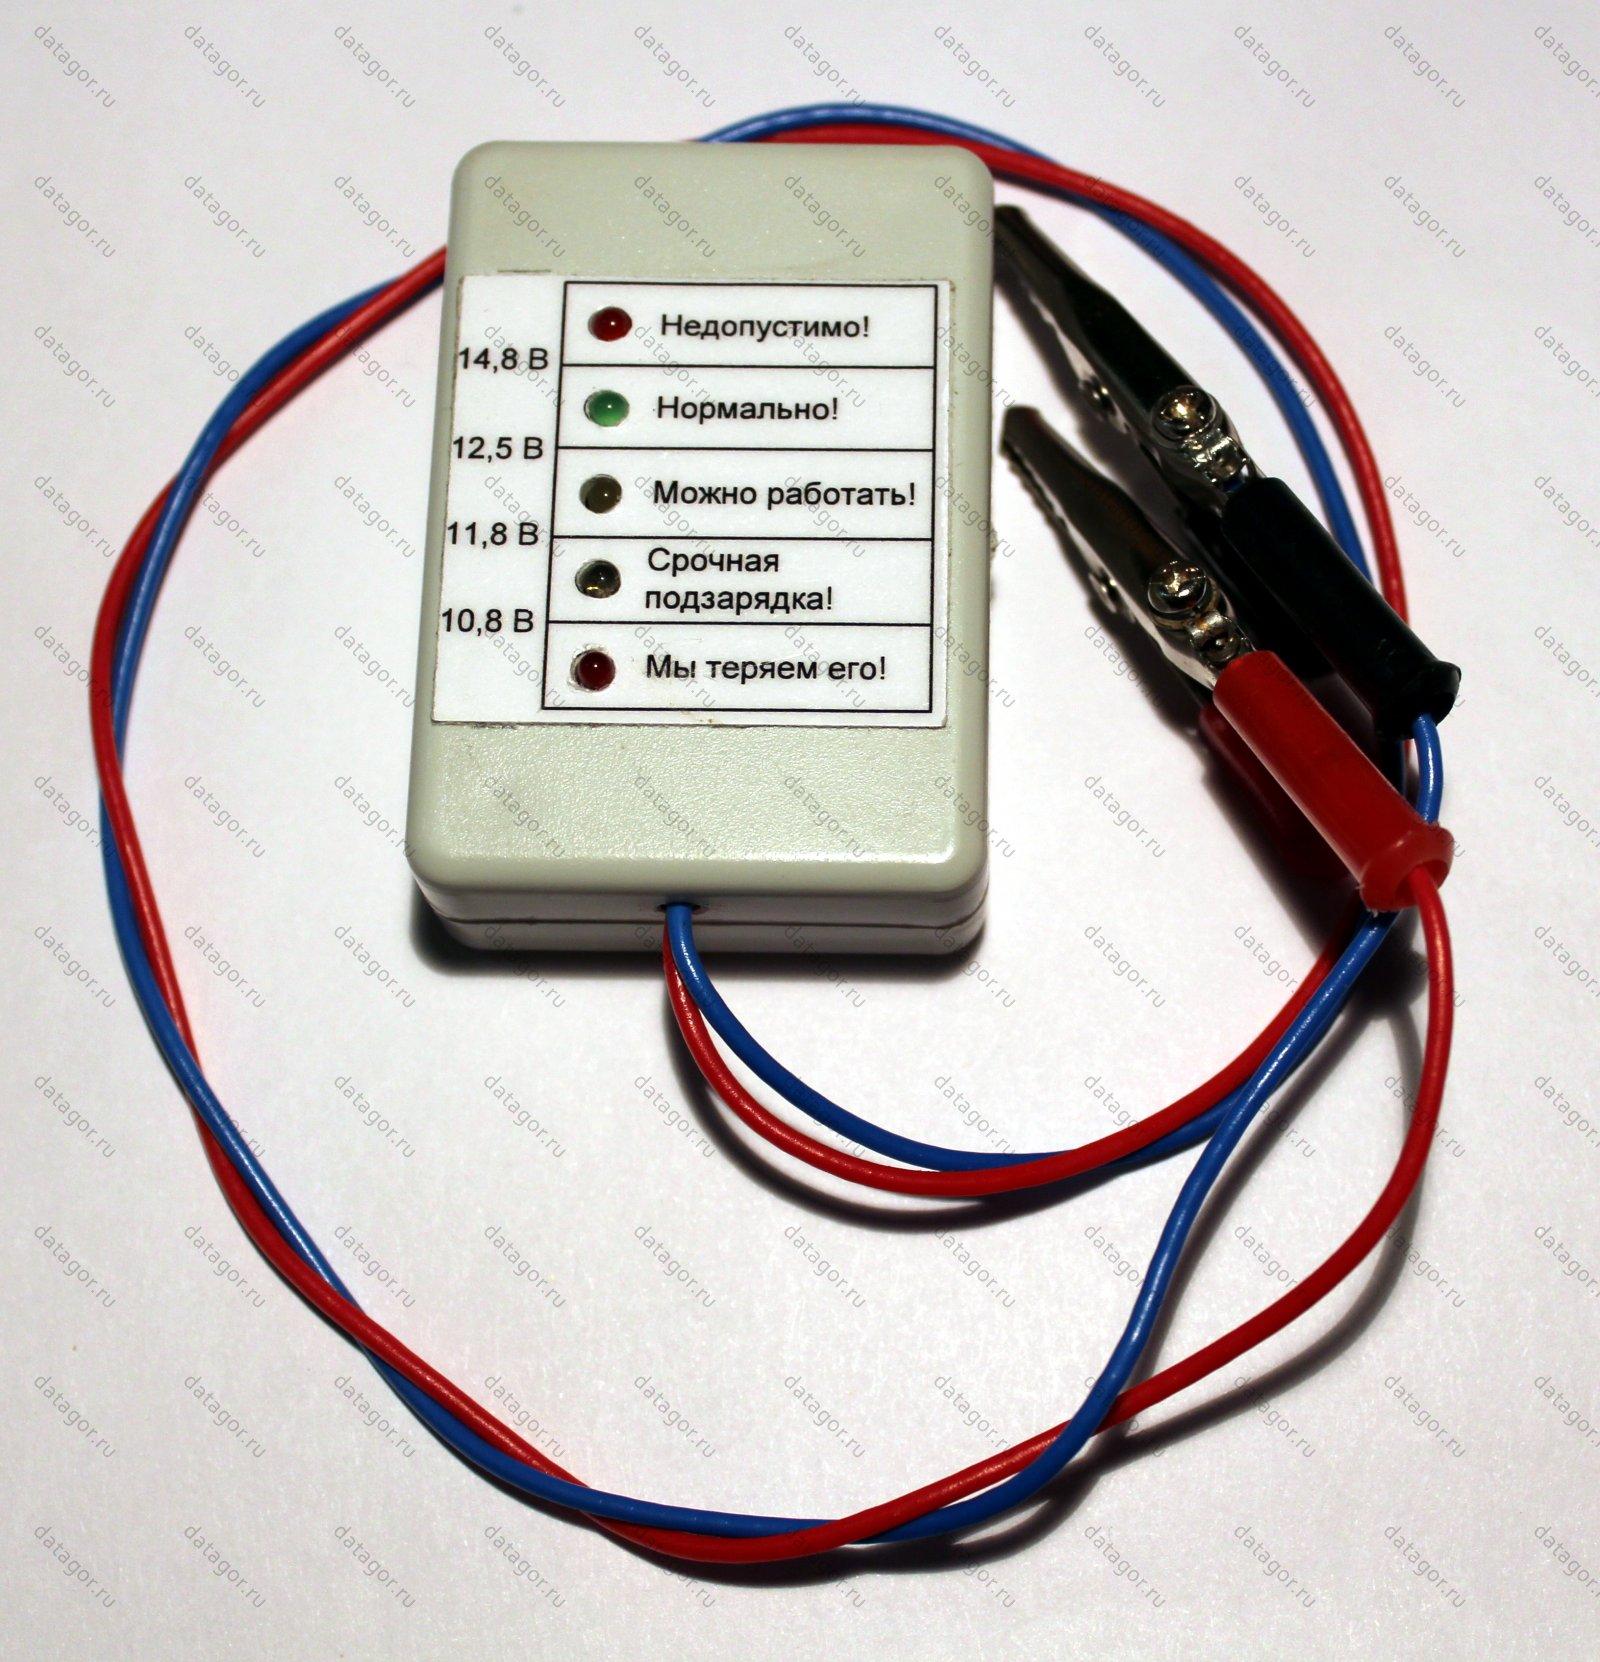 схема индикатора заряда аккумулятора на светодиодах